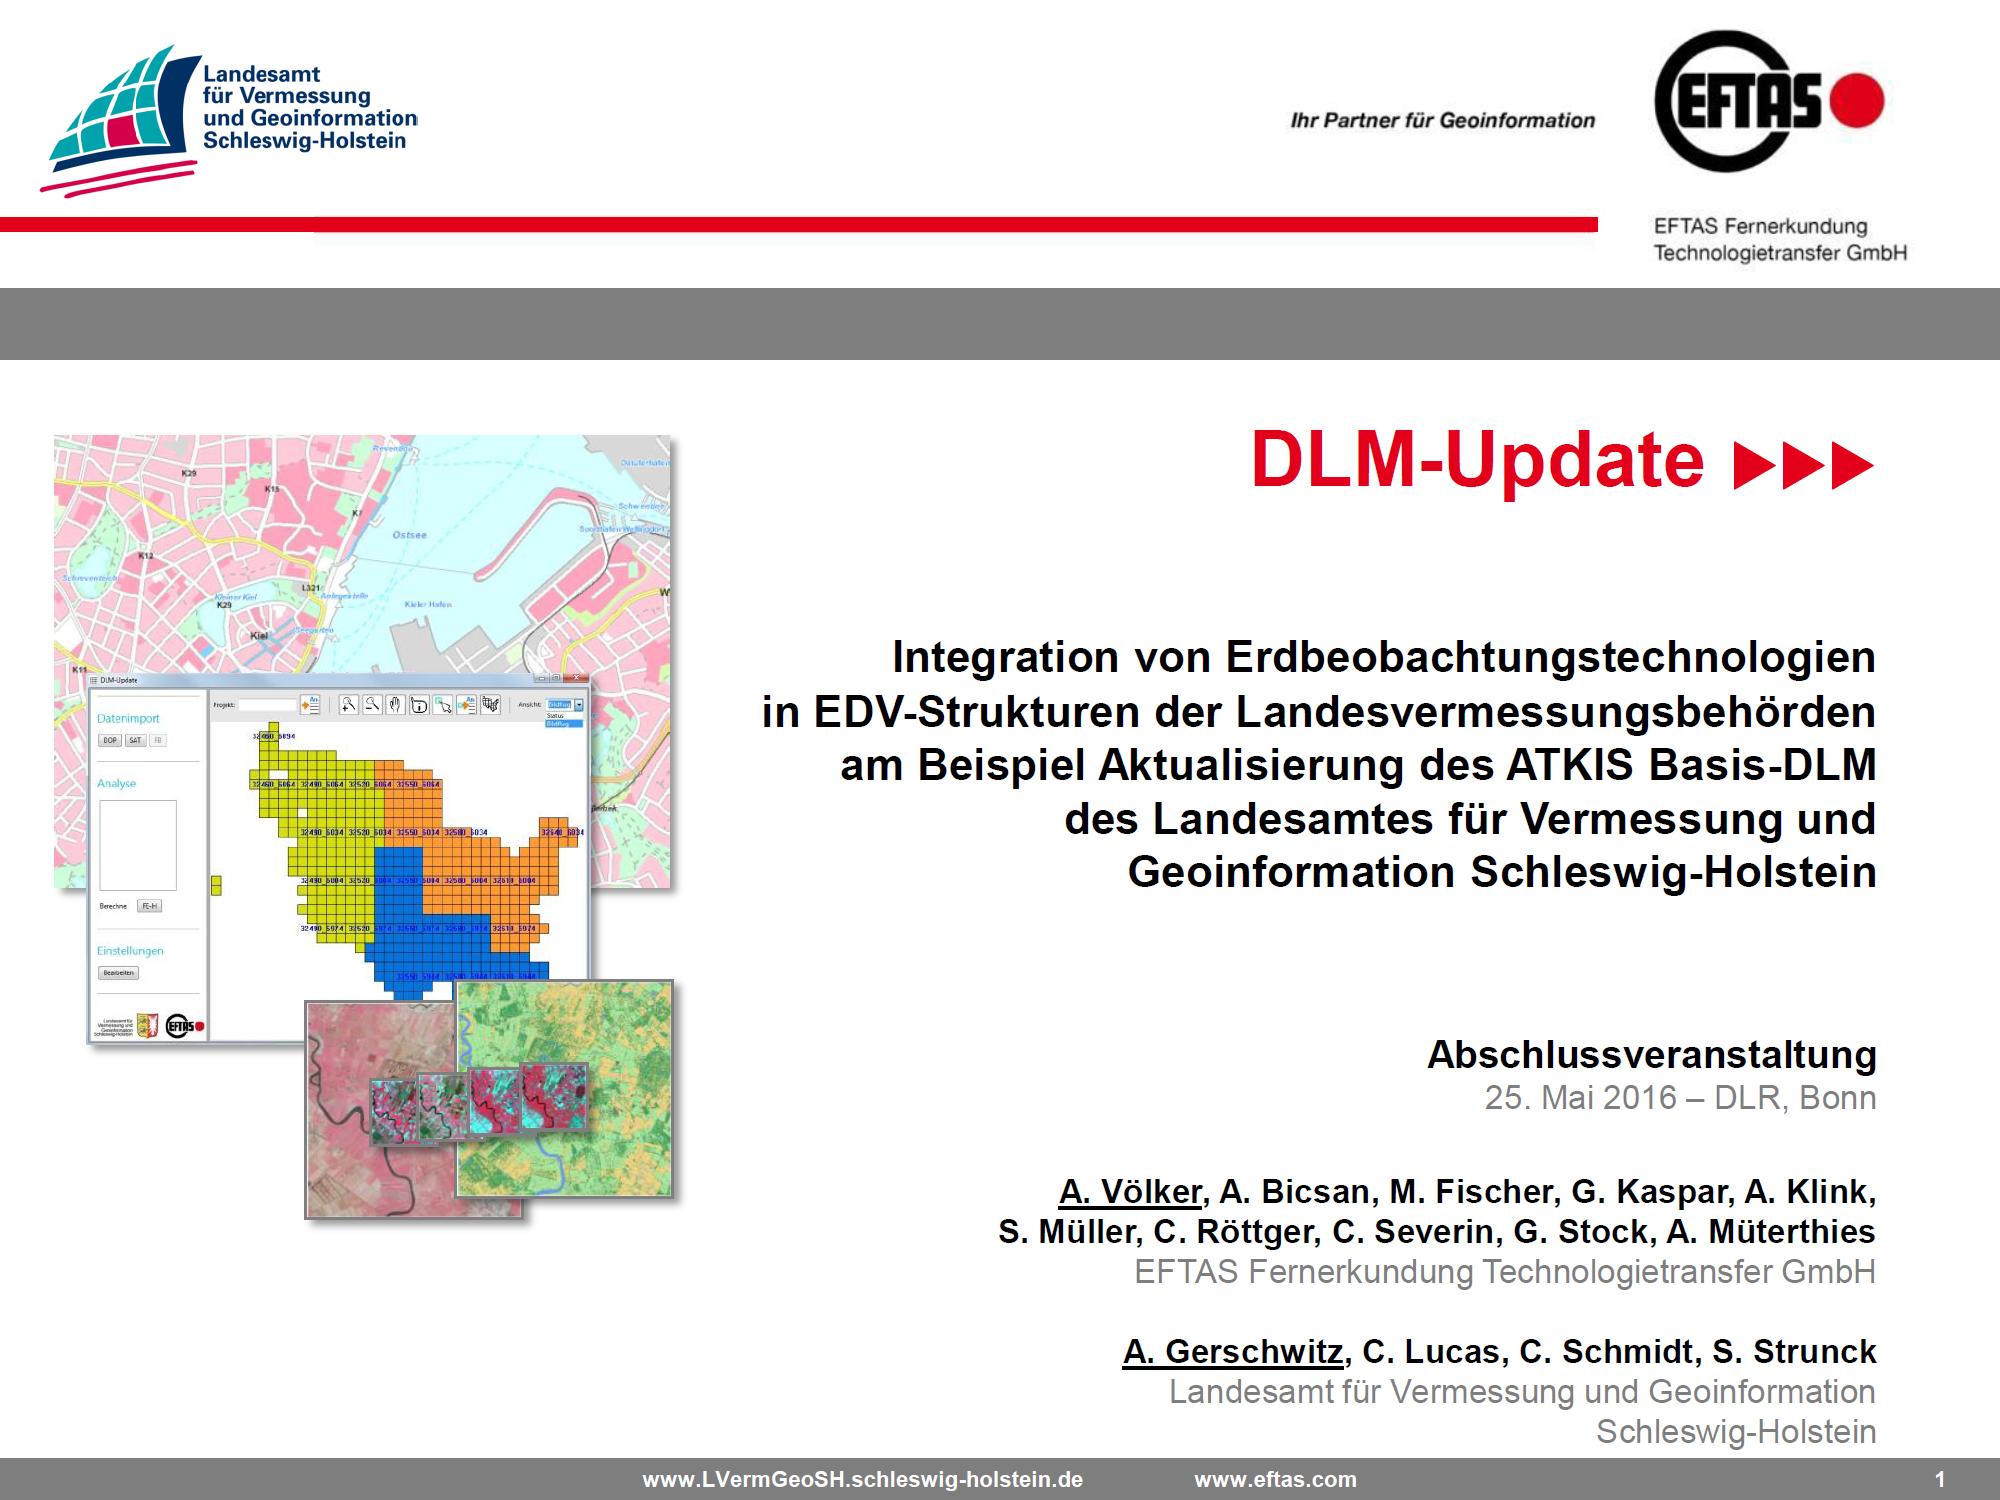 DLM-Update Workshop Bonn 2016